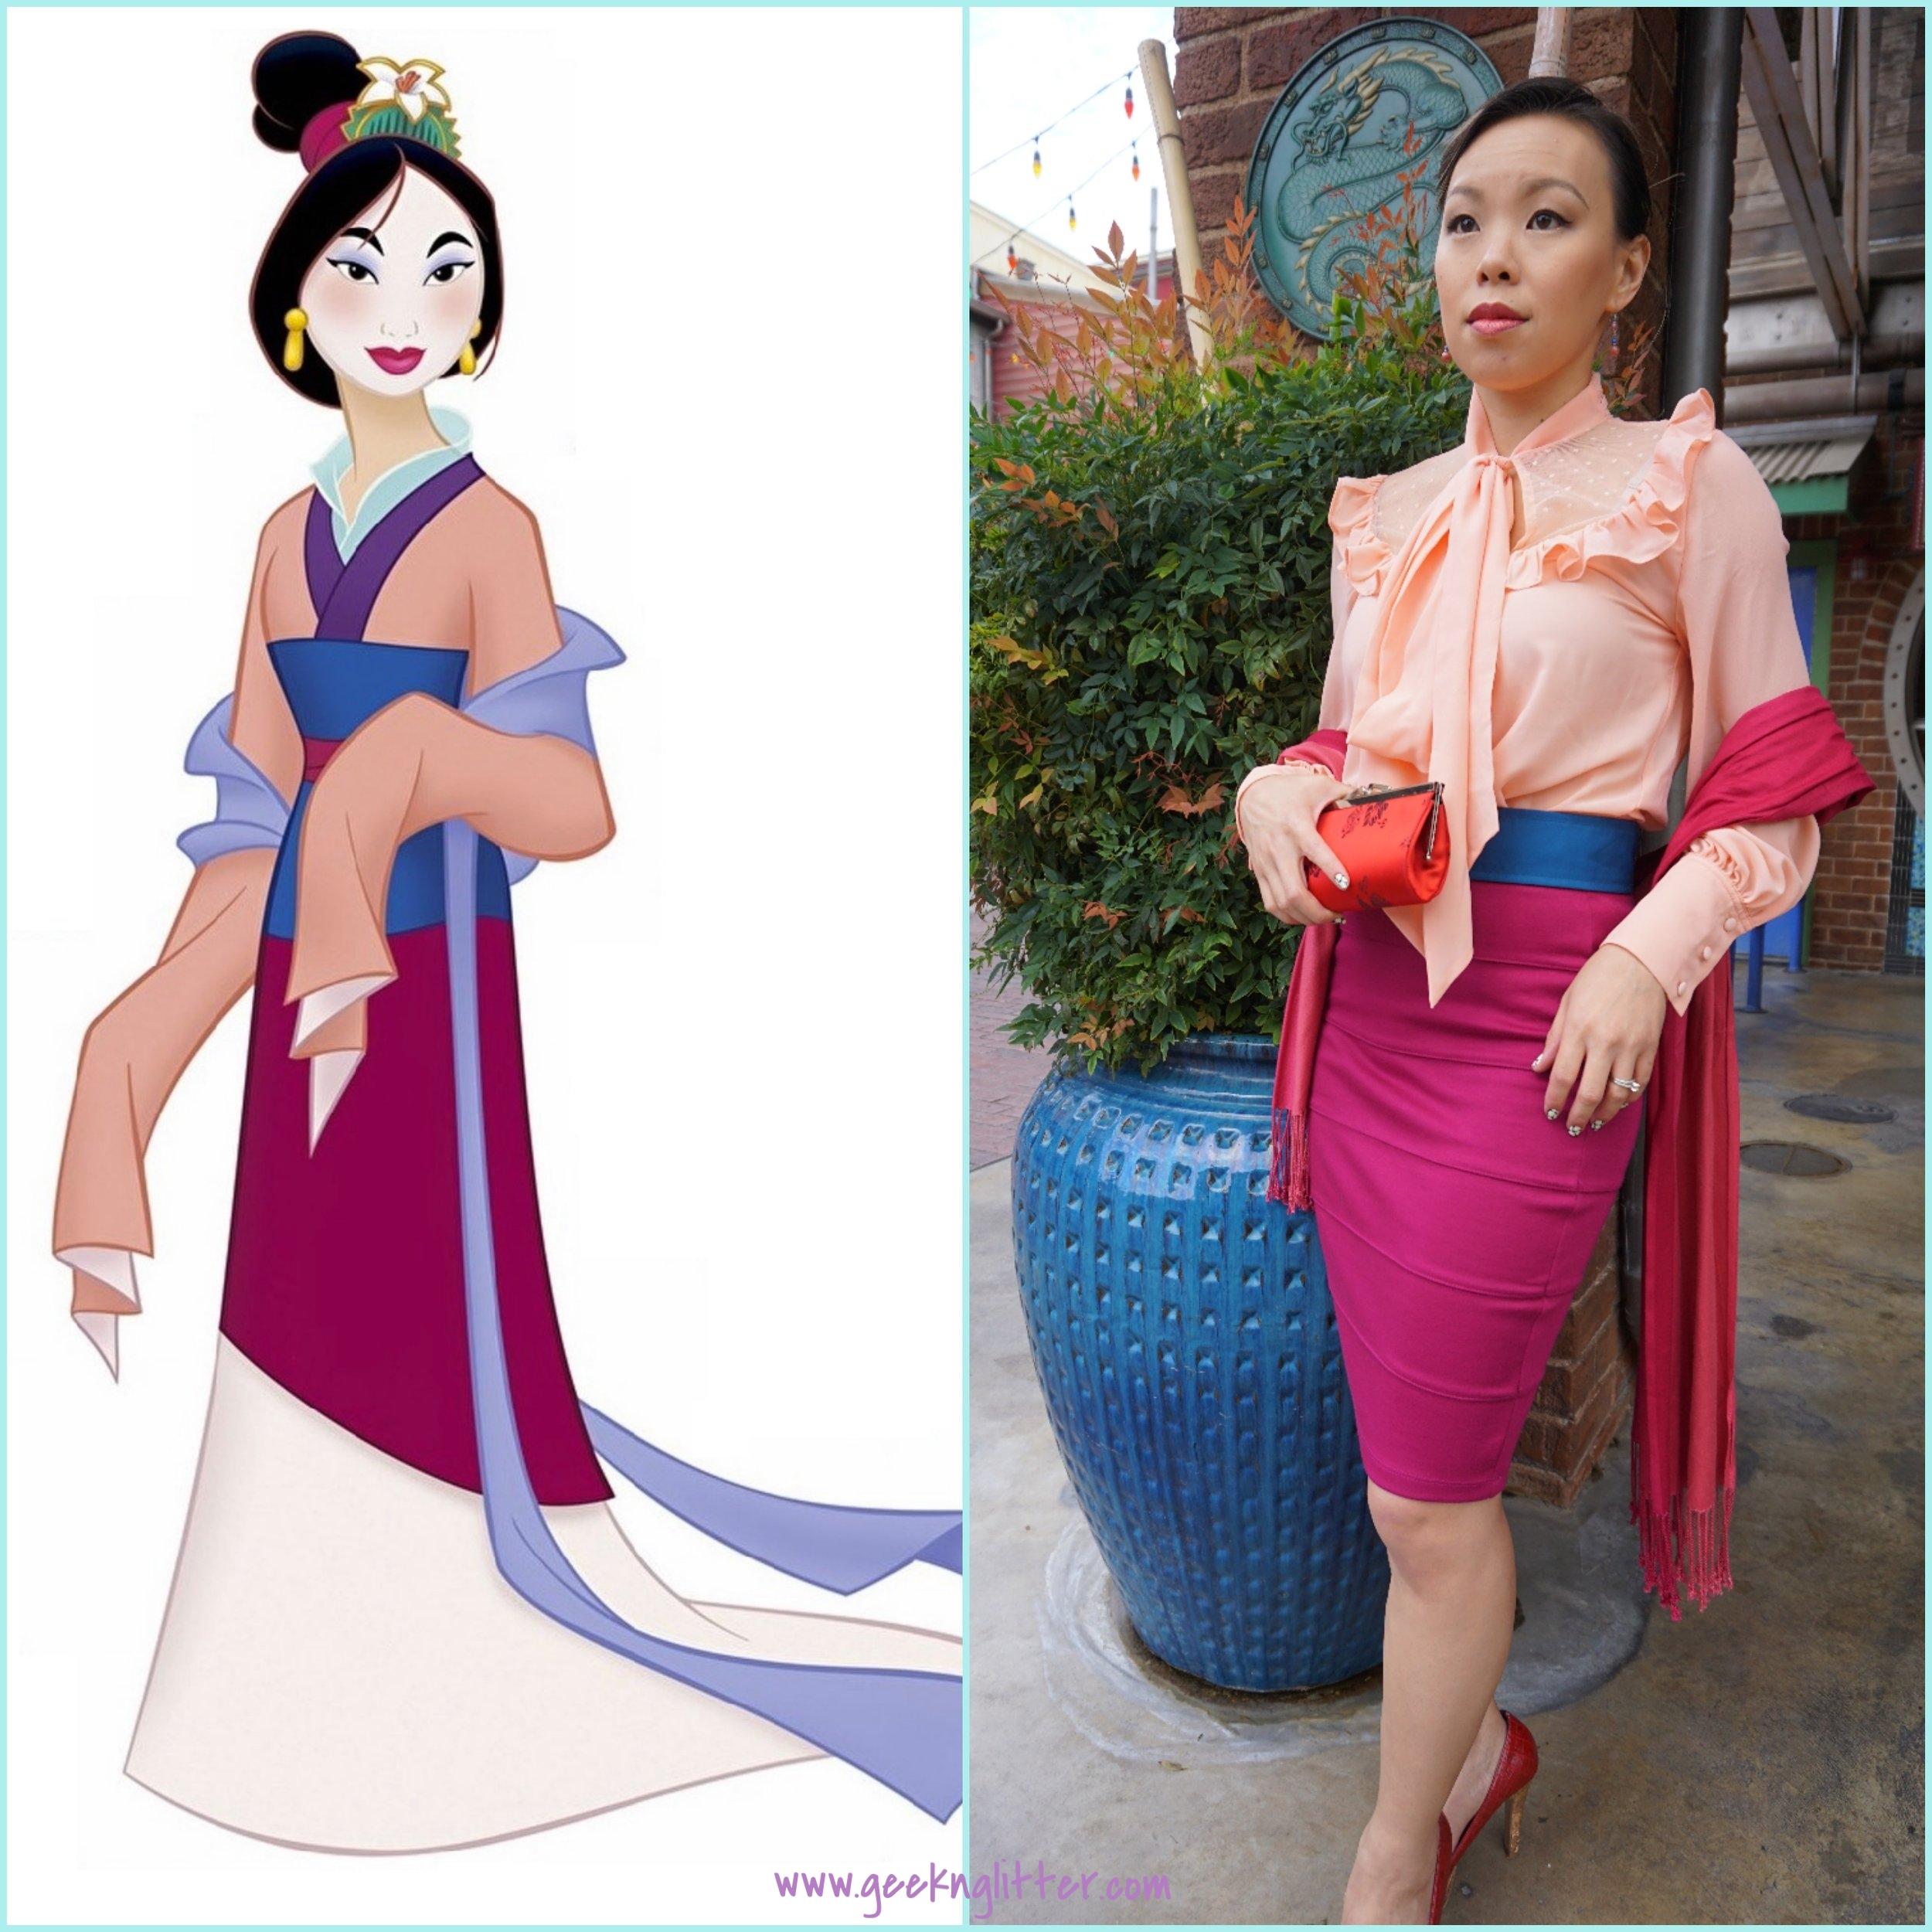 Mulan side by side comparison